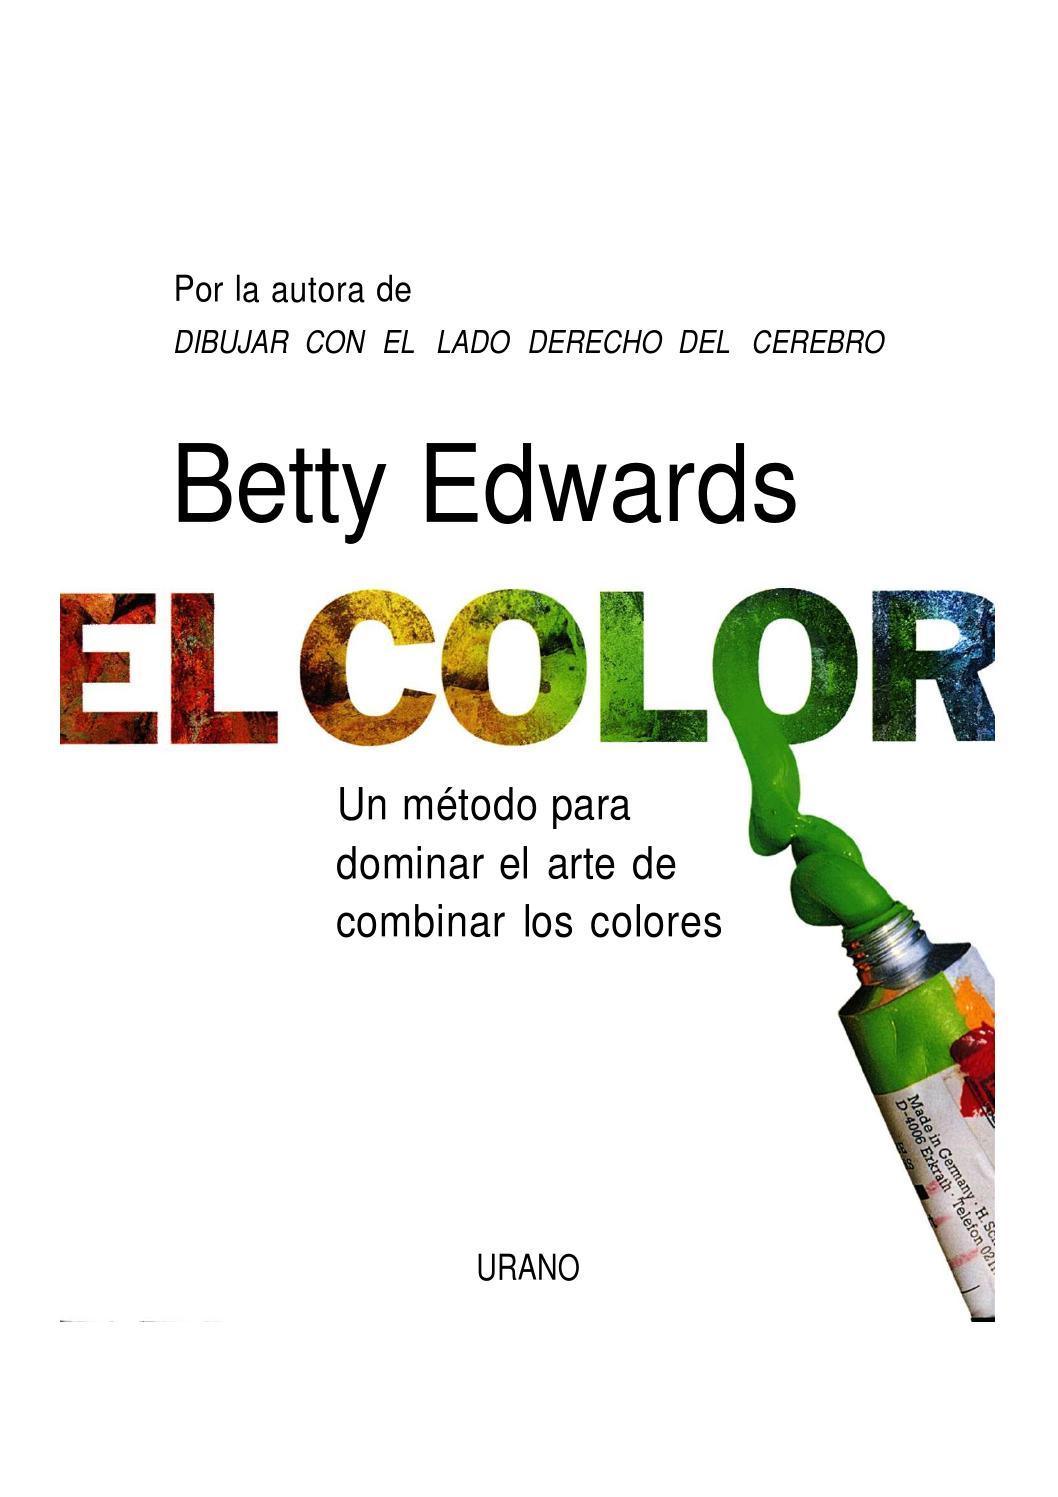 El color betty edwards by lmv01 - issuu